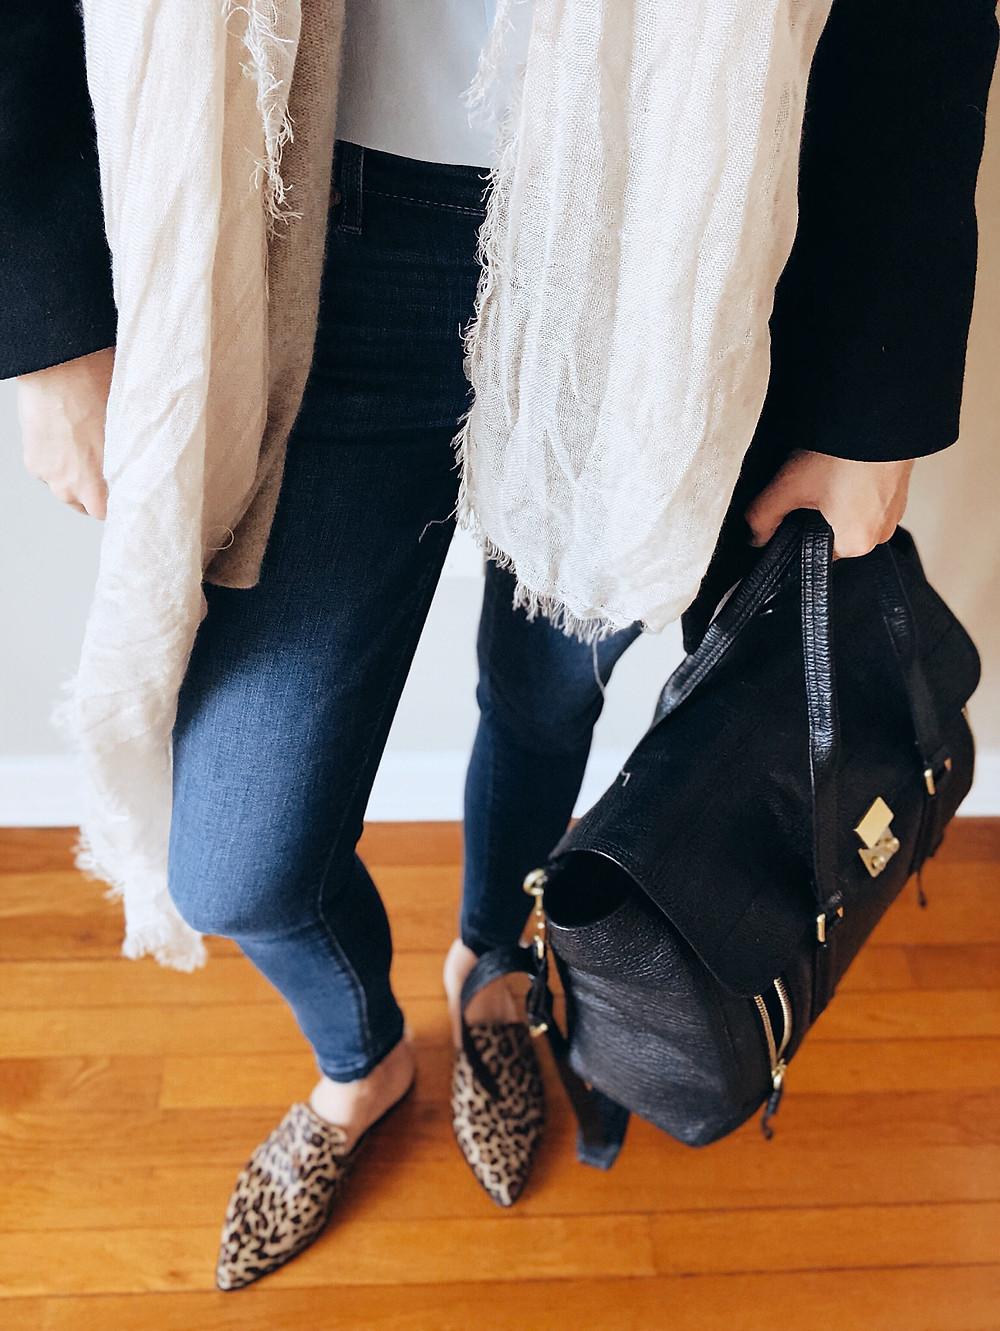 Black Phillip Lim Pashlii bag and leopard flats worn with jeans.